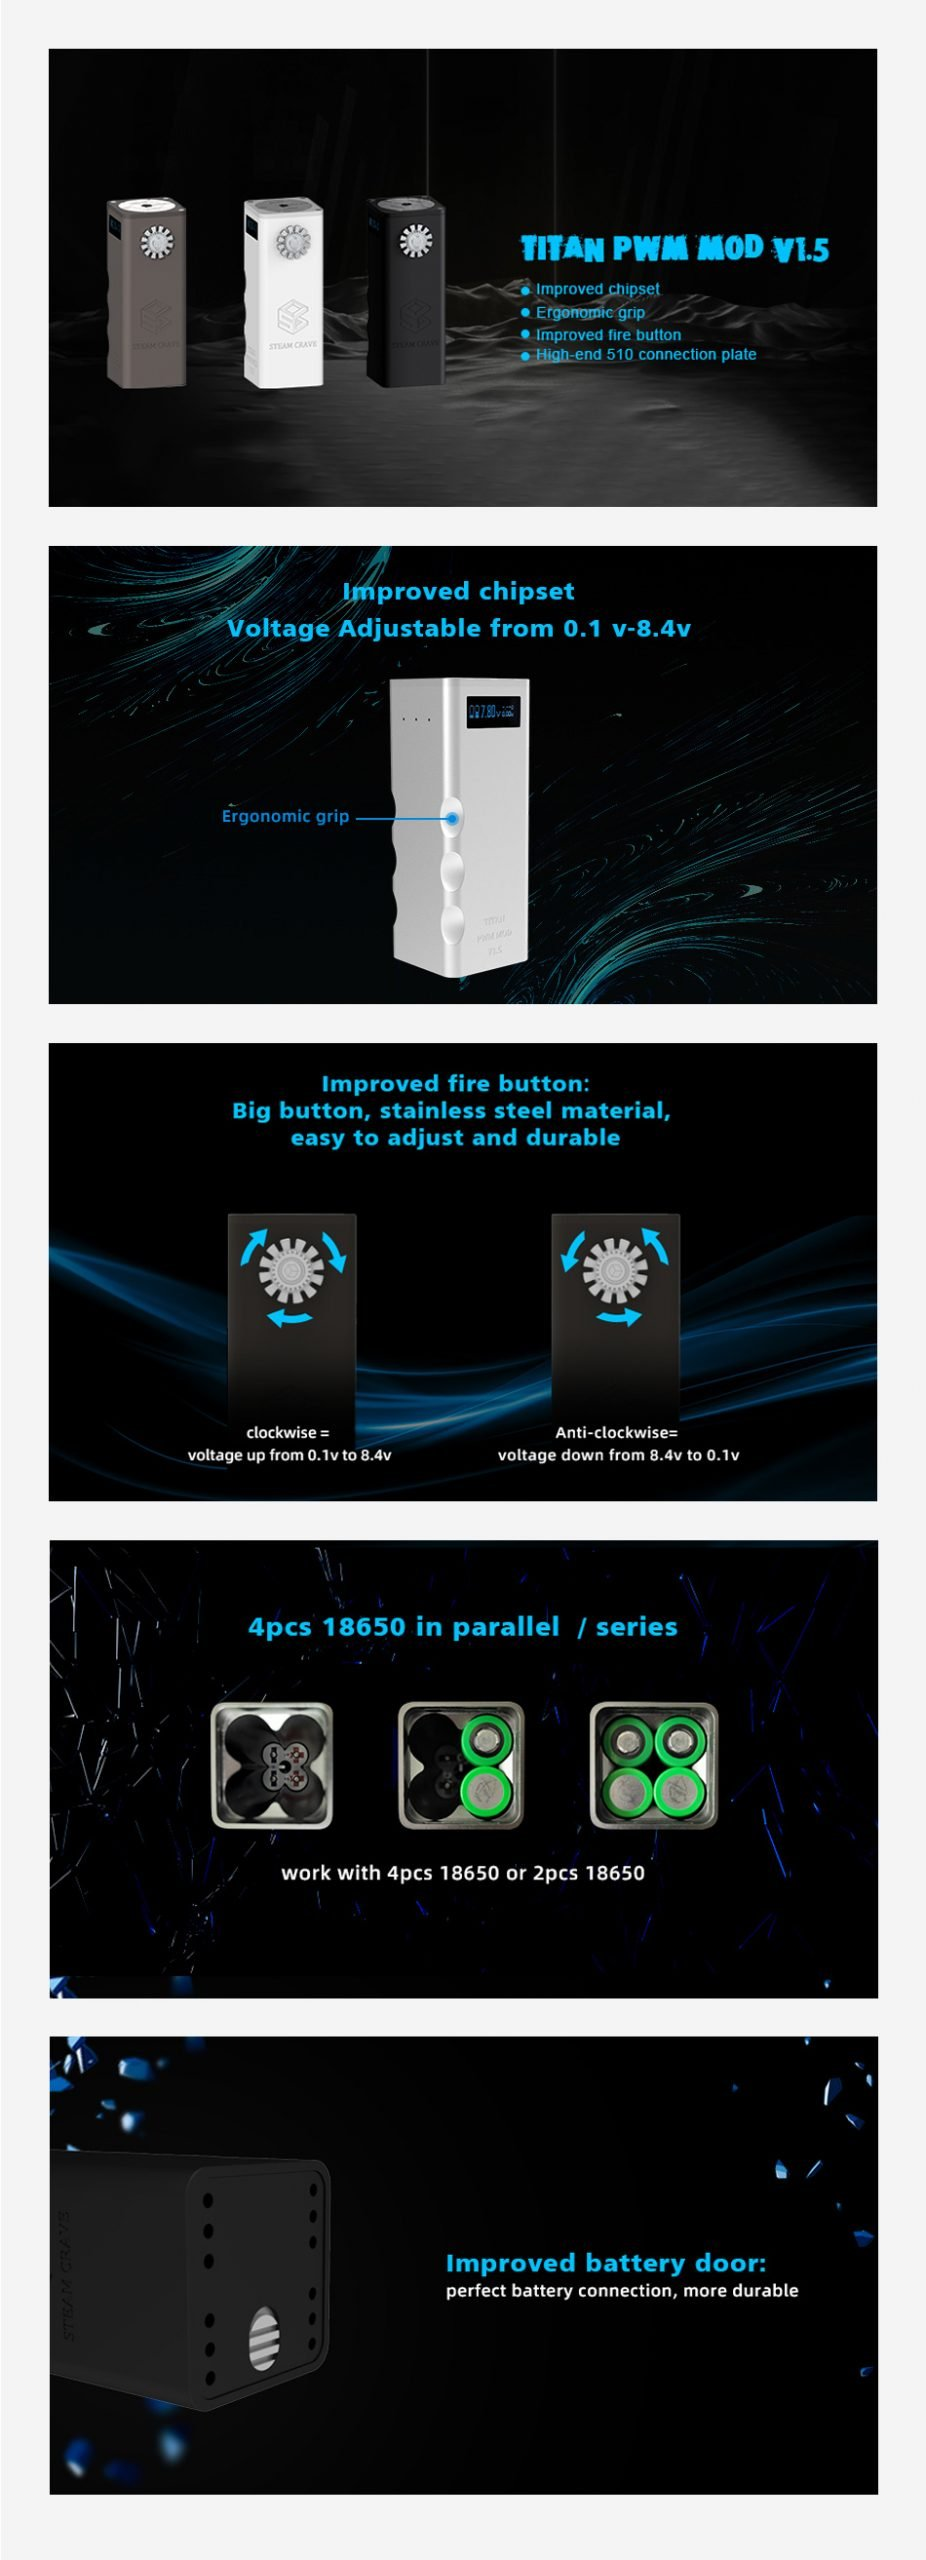 Steam-Crave-Titan-PWM-VV-MOD-V1.5-Features